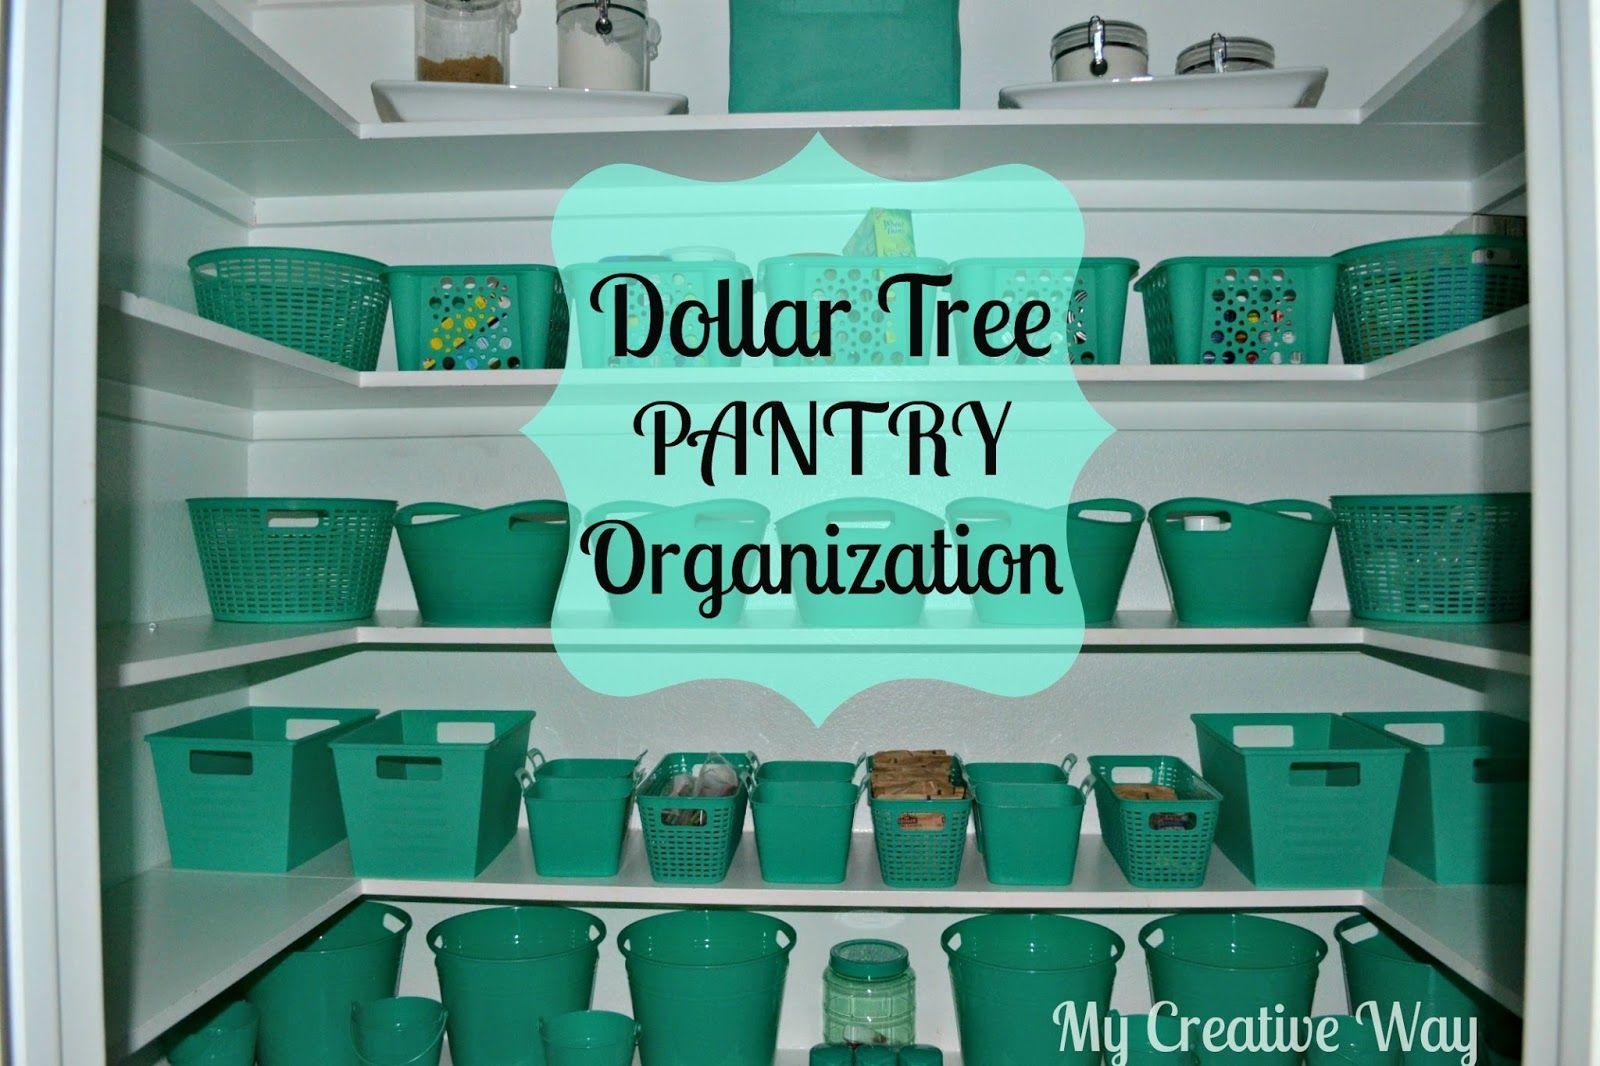 Dollar Tree Pantry Organization #largepantryideas